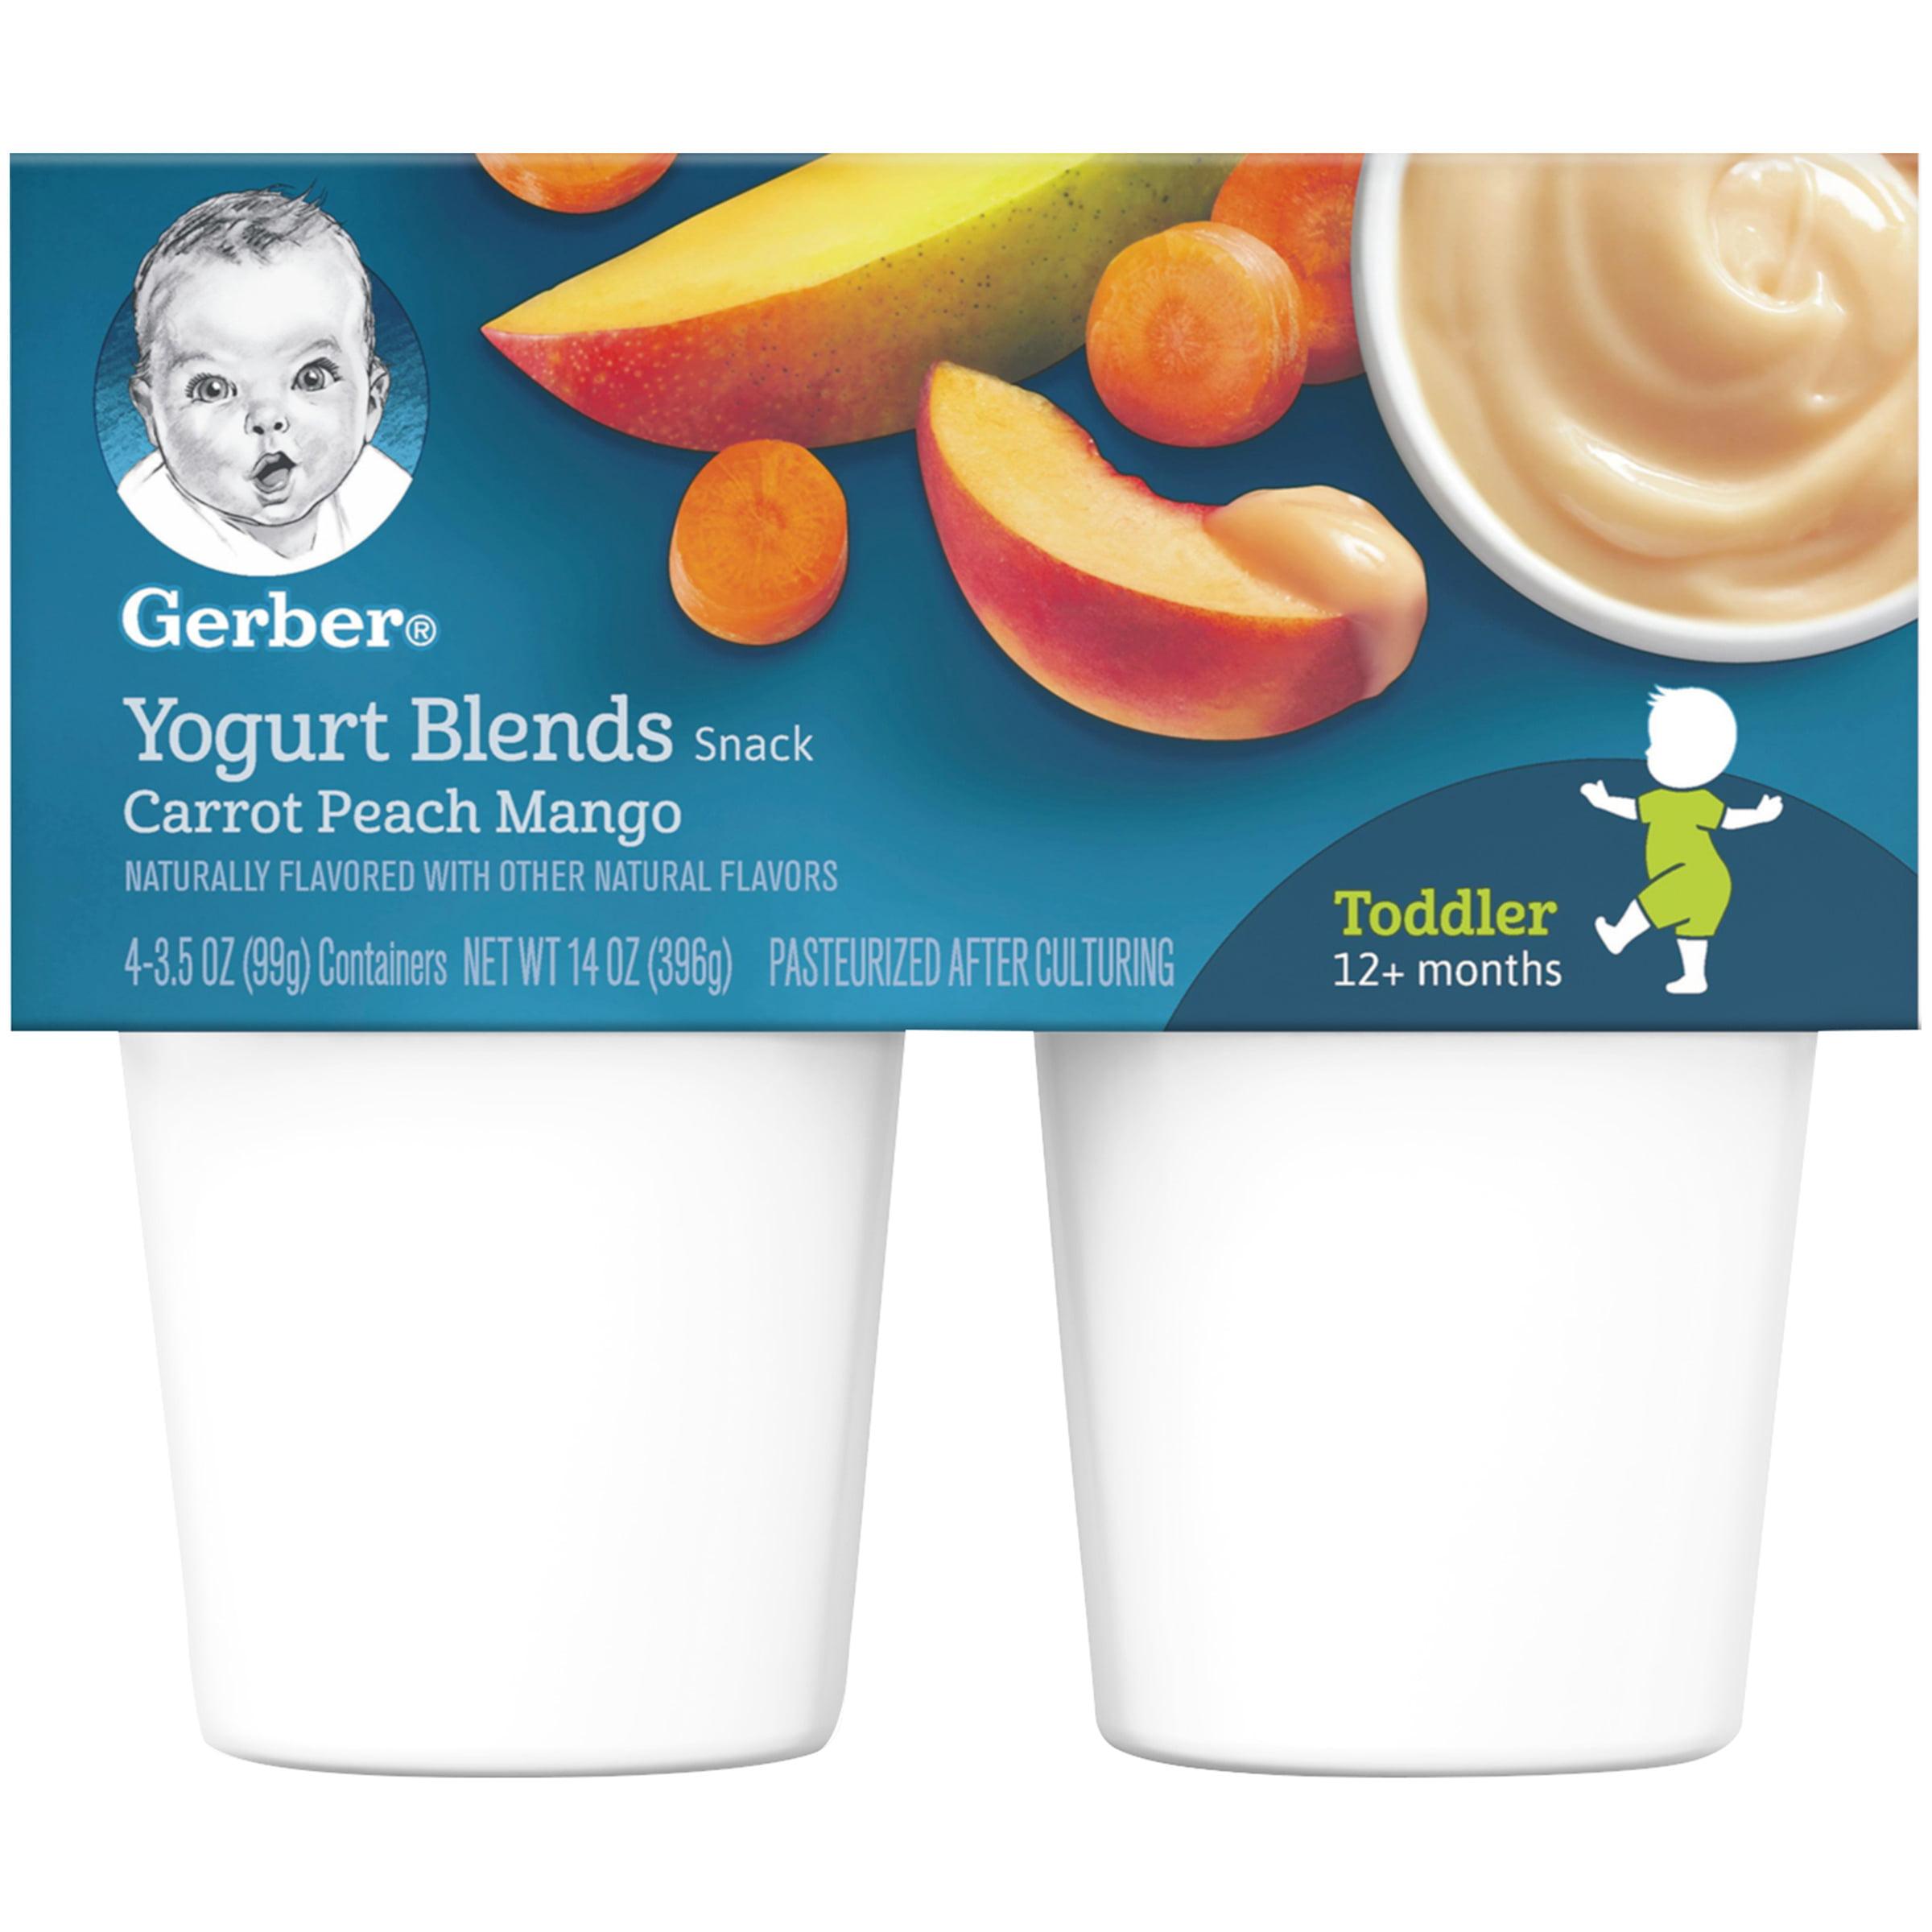 Gerber Yogurt Blends Snack, Carrot Peach Mango, 3.5 oz Cups, 4 Count